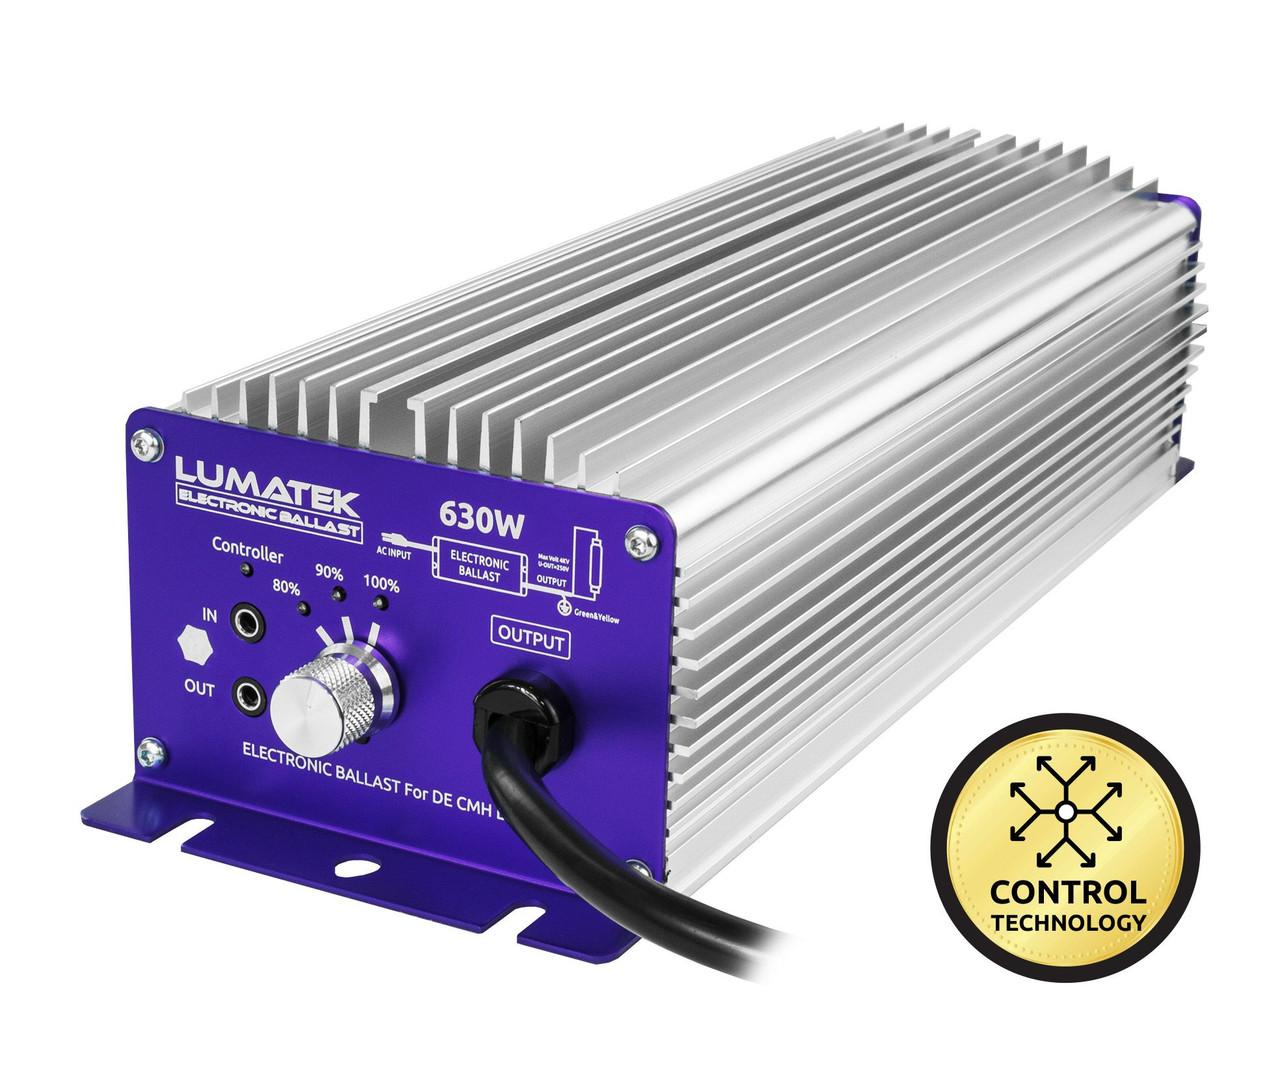 LUMATEK CHM 630 WATT CONTROLLABLE BALLAST